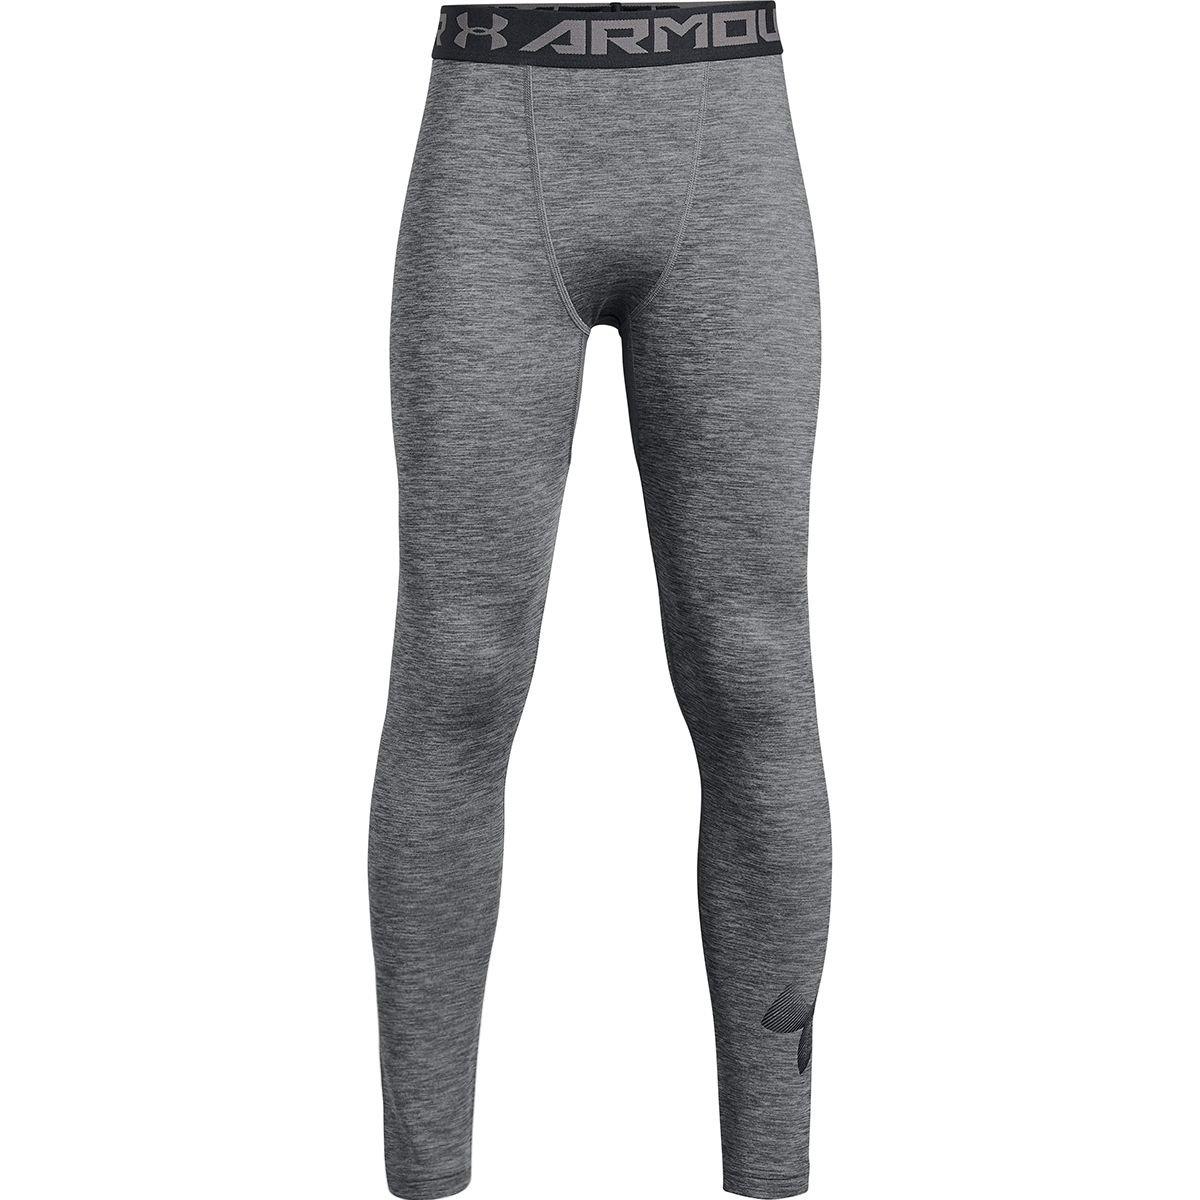 Under Armour Boys' Cold Gear Legging 1306067